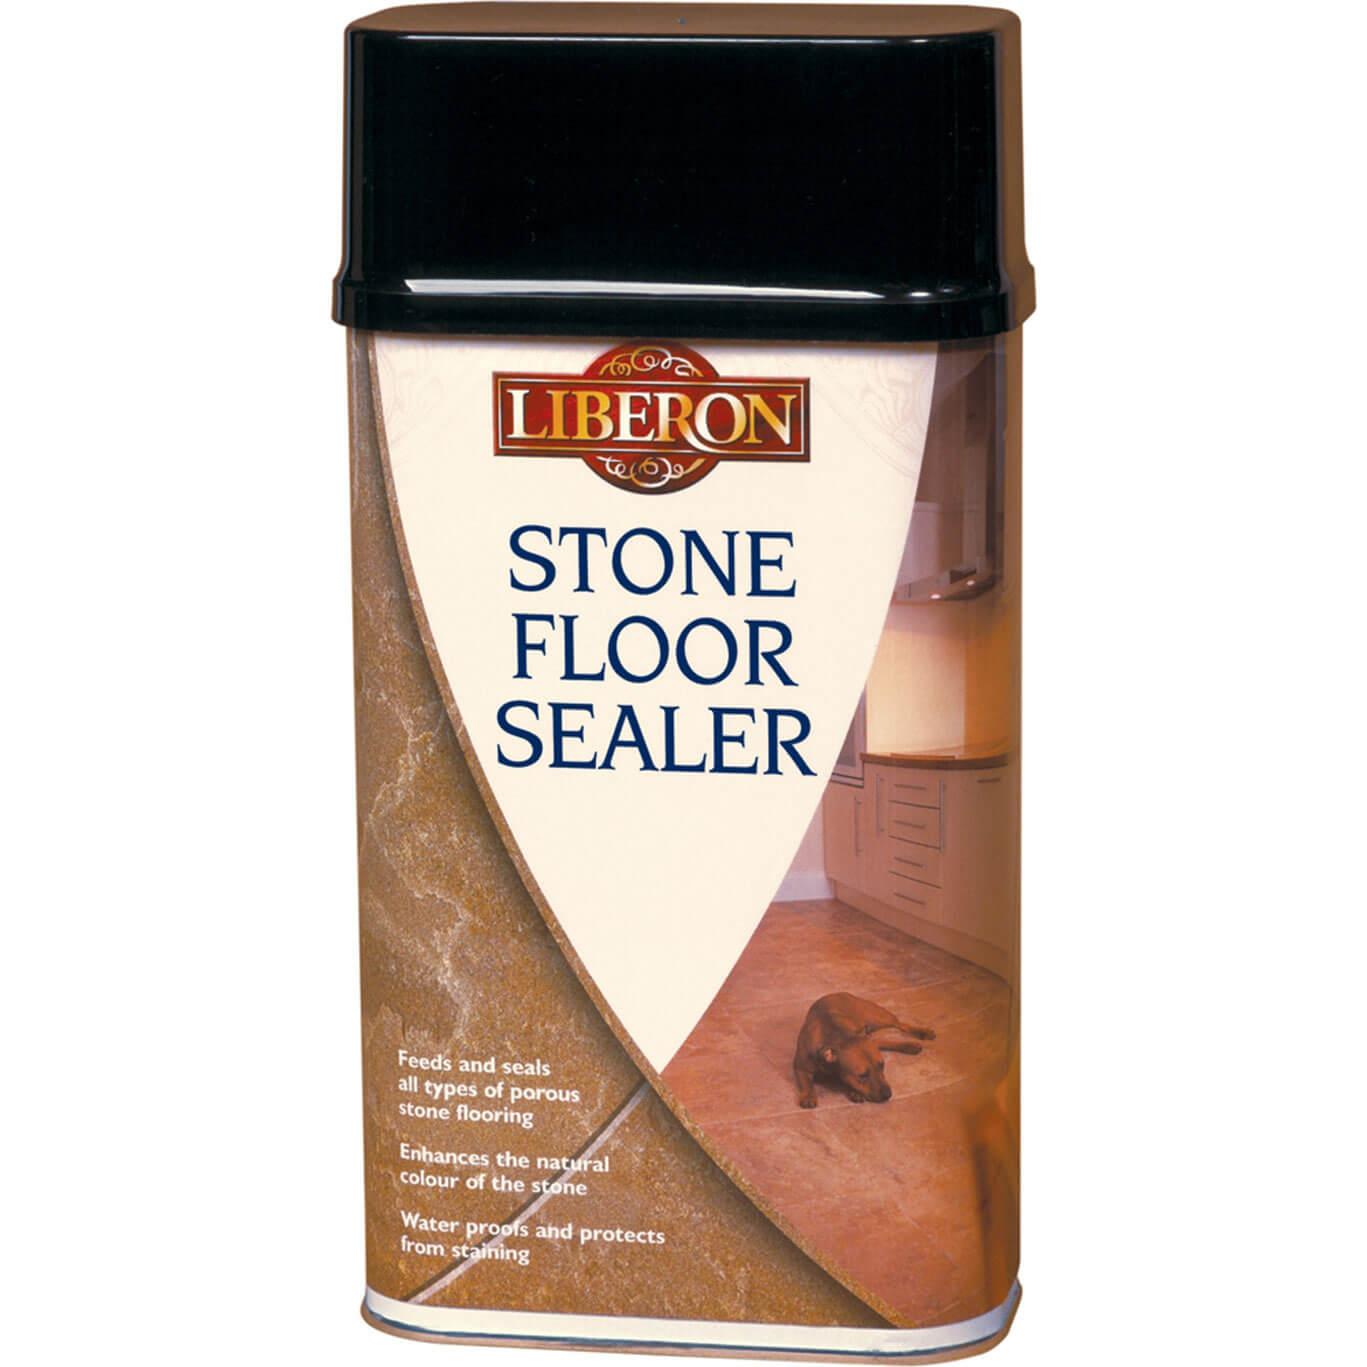 Liberon Stone Floor Sealer 1 Litre